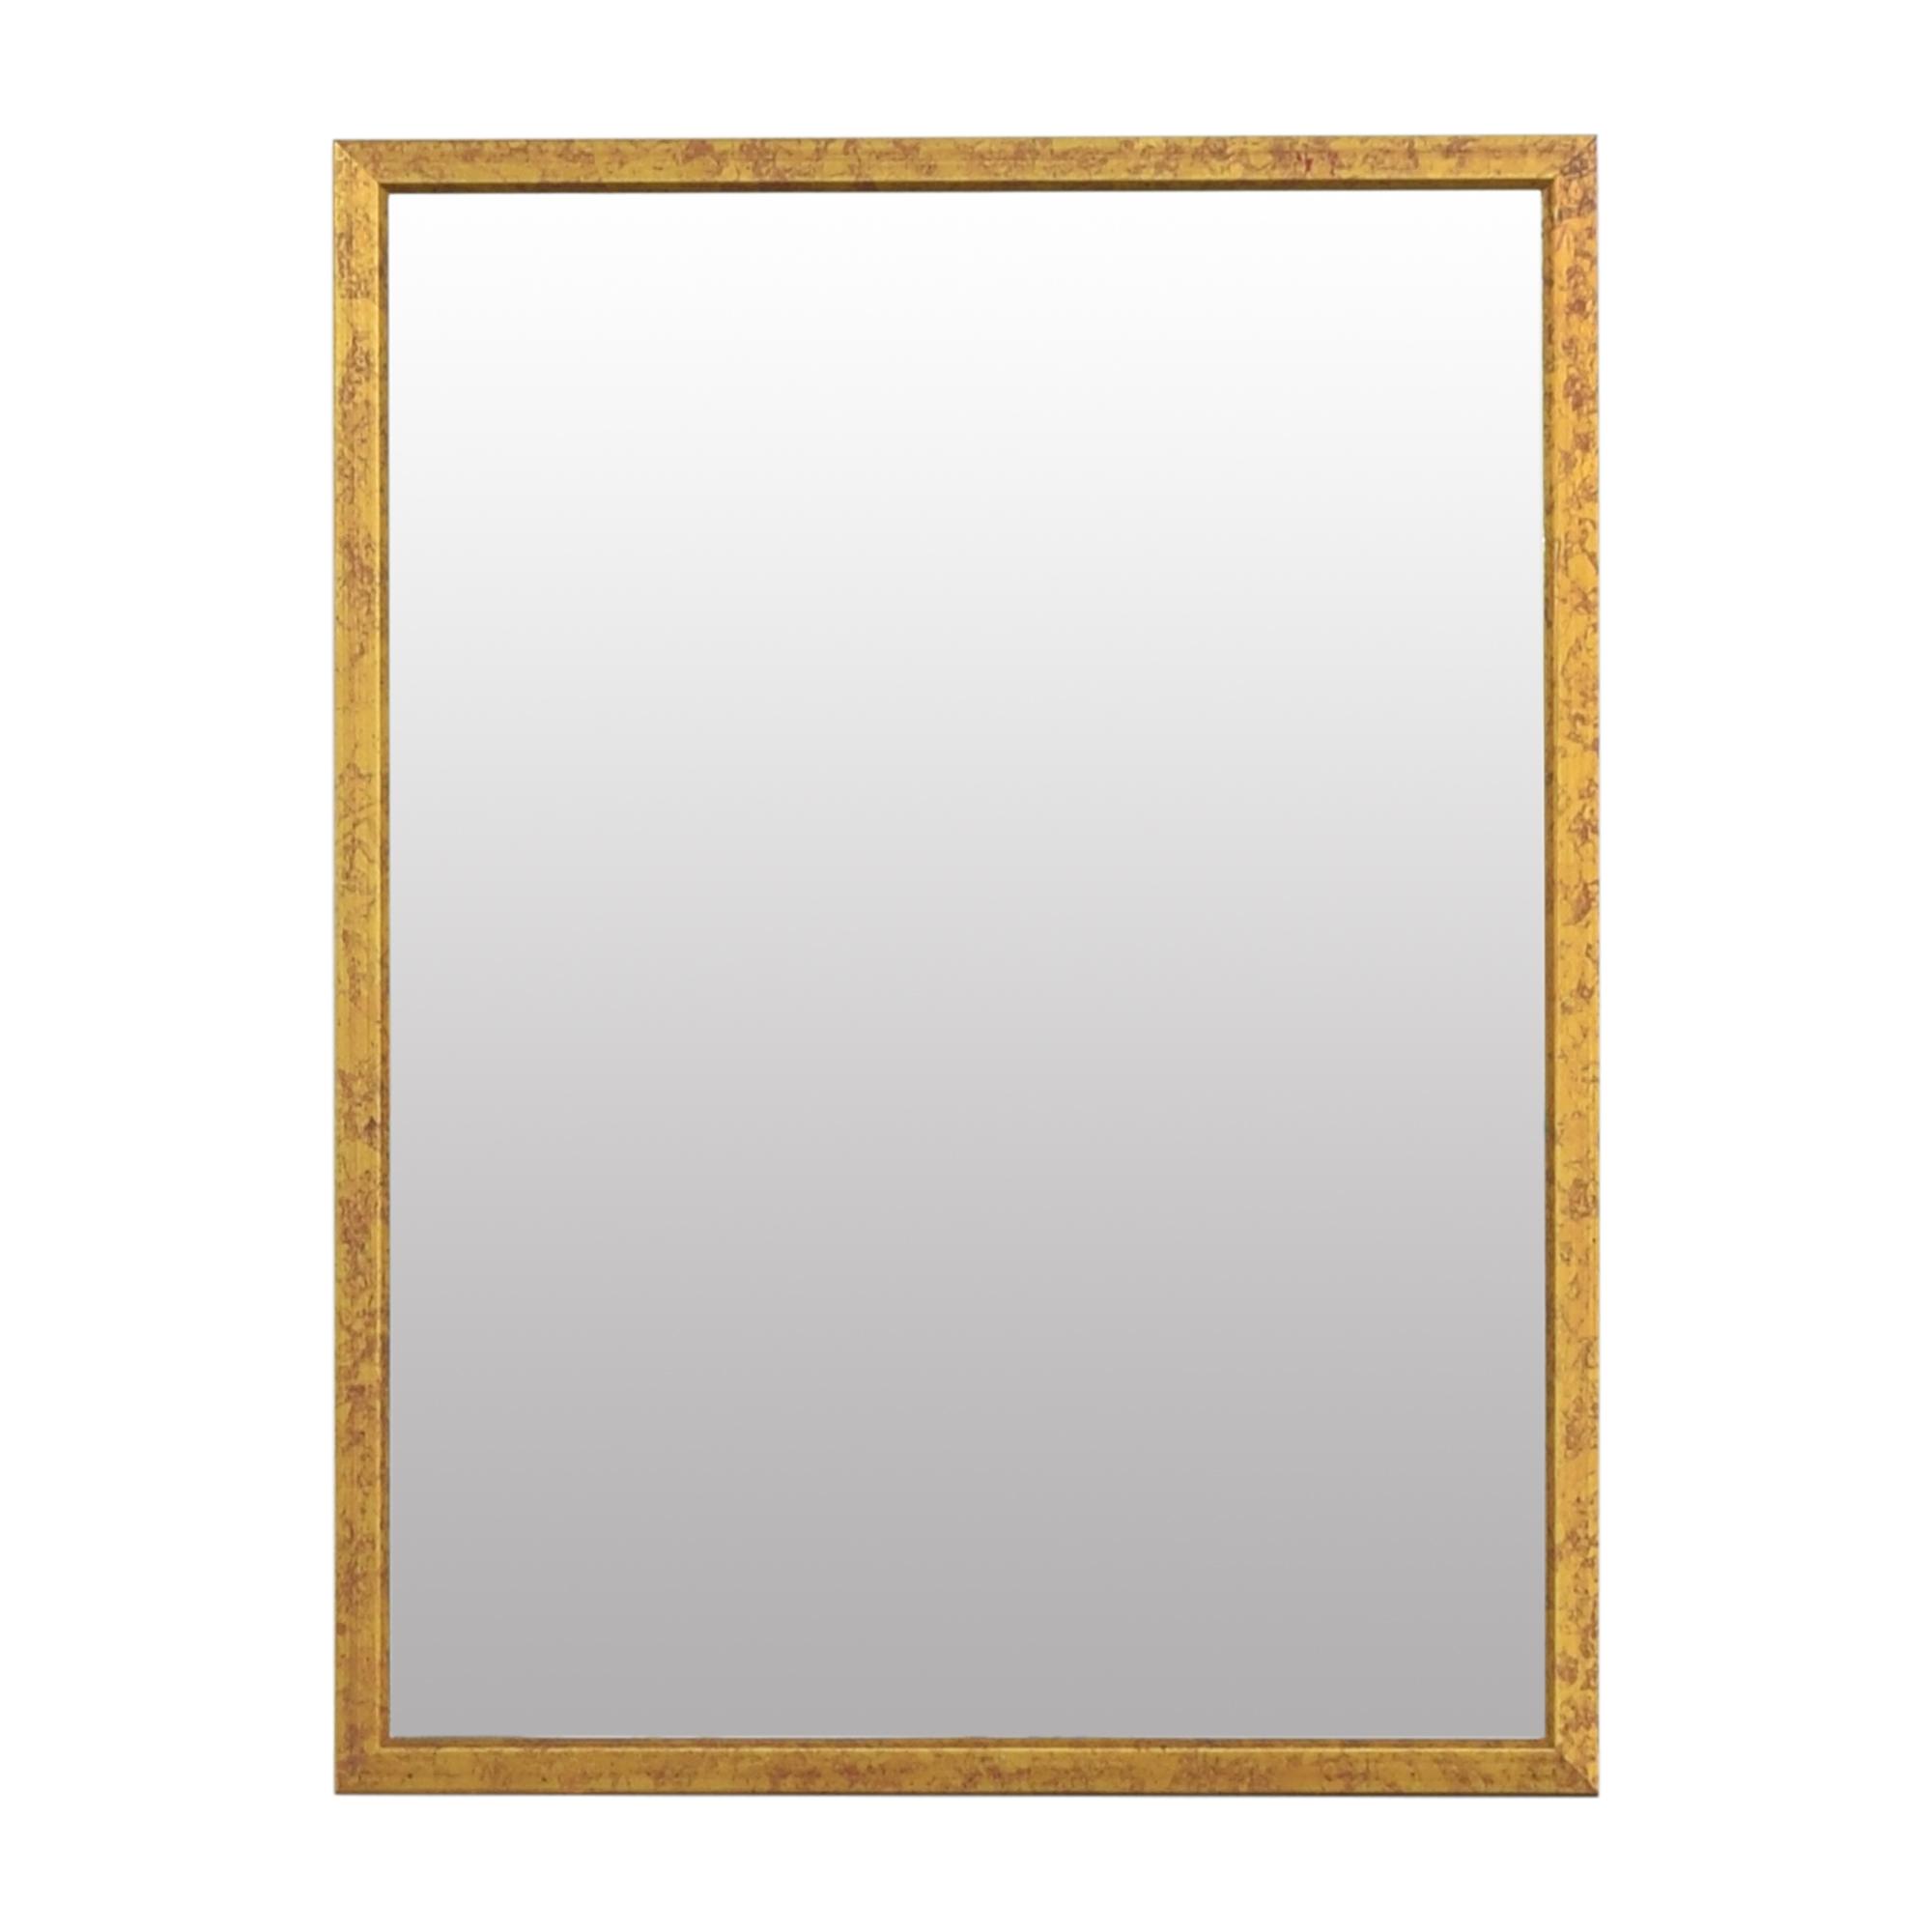 buy Framed Beveled Wall Mirror  Decor